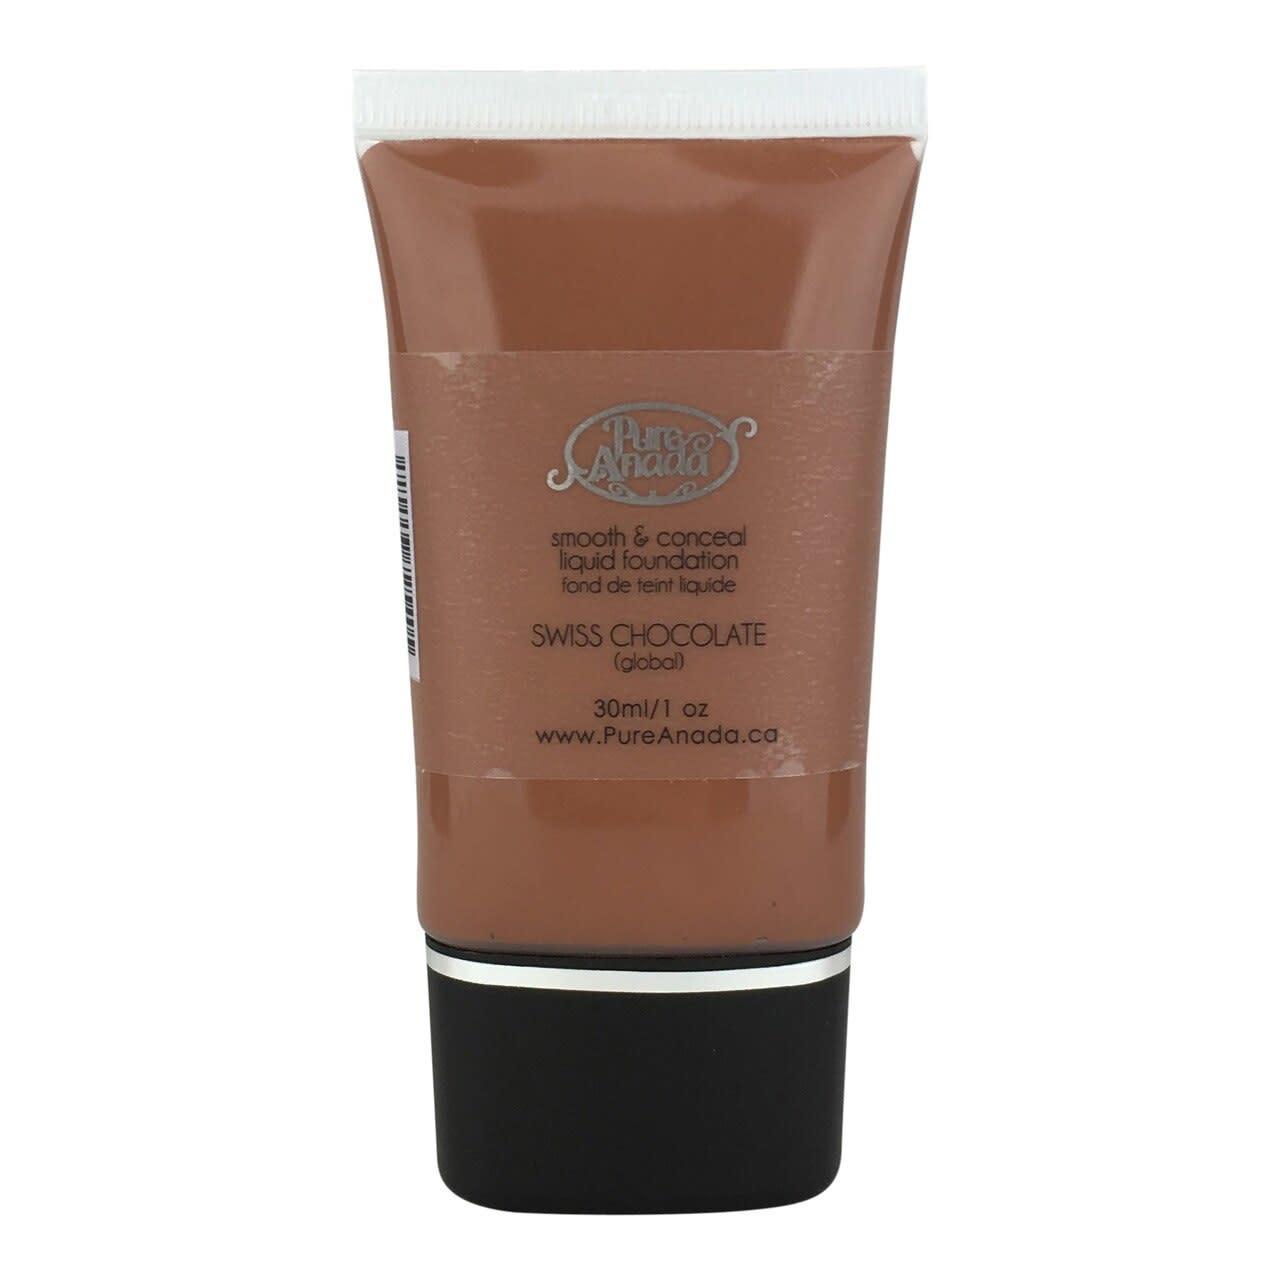 Liquid Foundation - Swiss Chocolate: Global (Neutral)-1